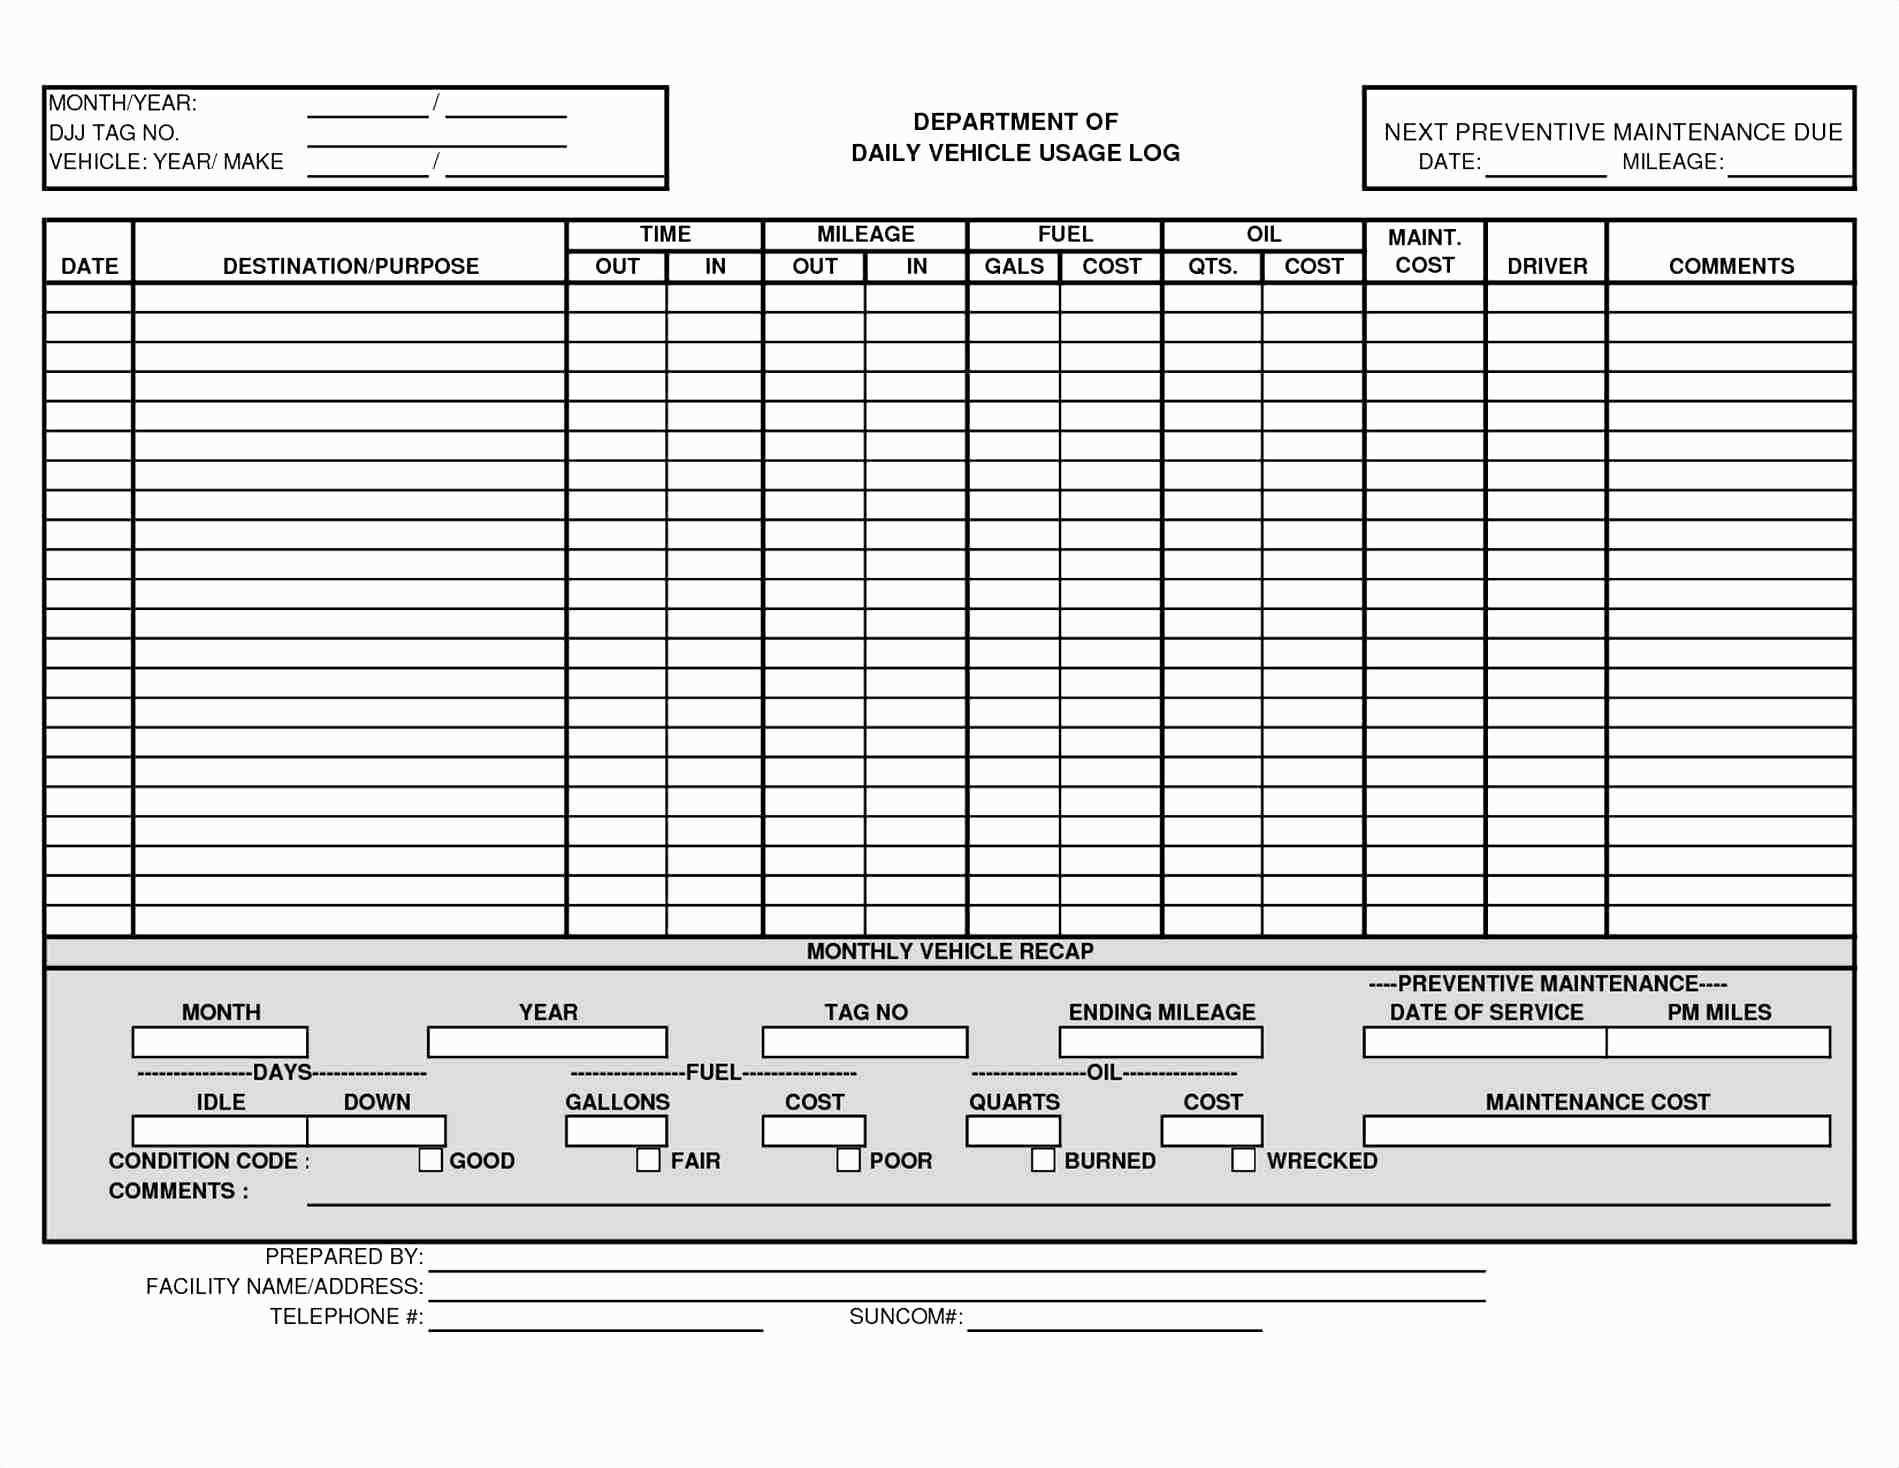 Letter Of Excel Spreadsheet For Vehicle Maintenance Within Excel Spreadsheet For Vehicle Maintenance Samples